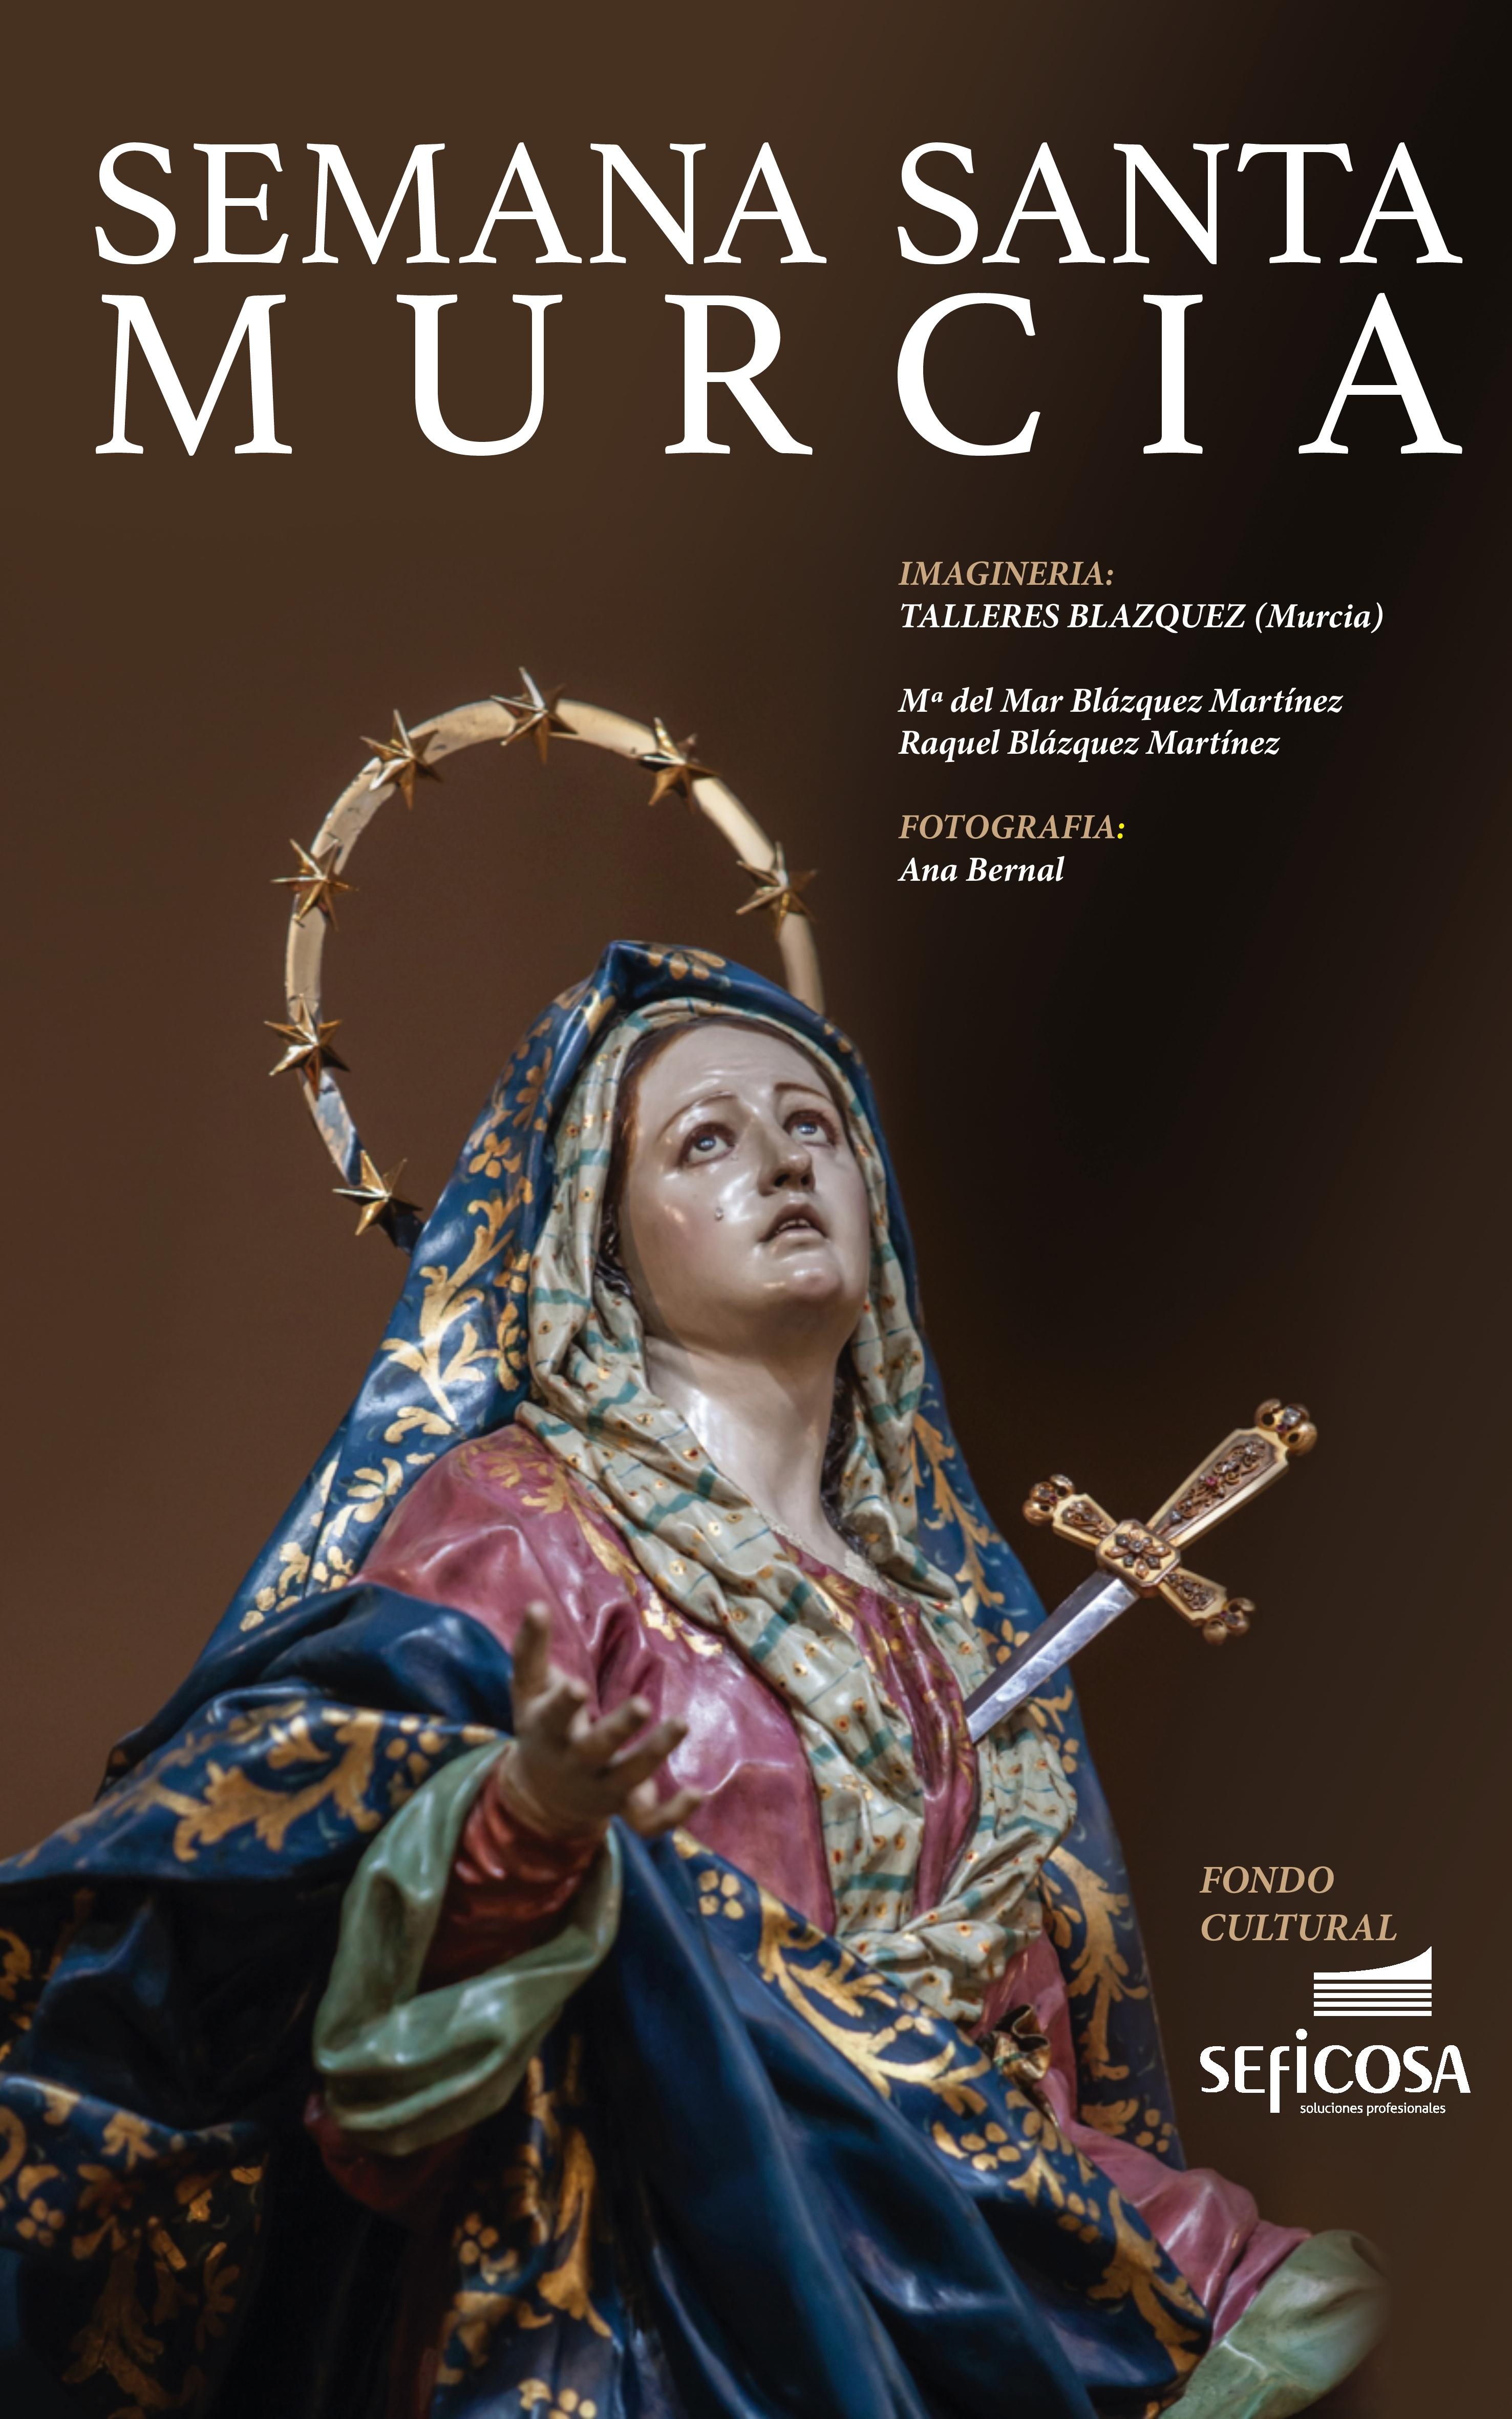 Semana Santa Murciana